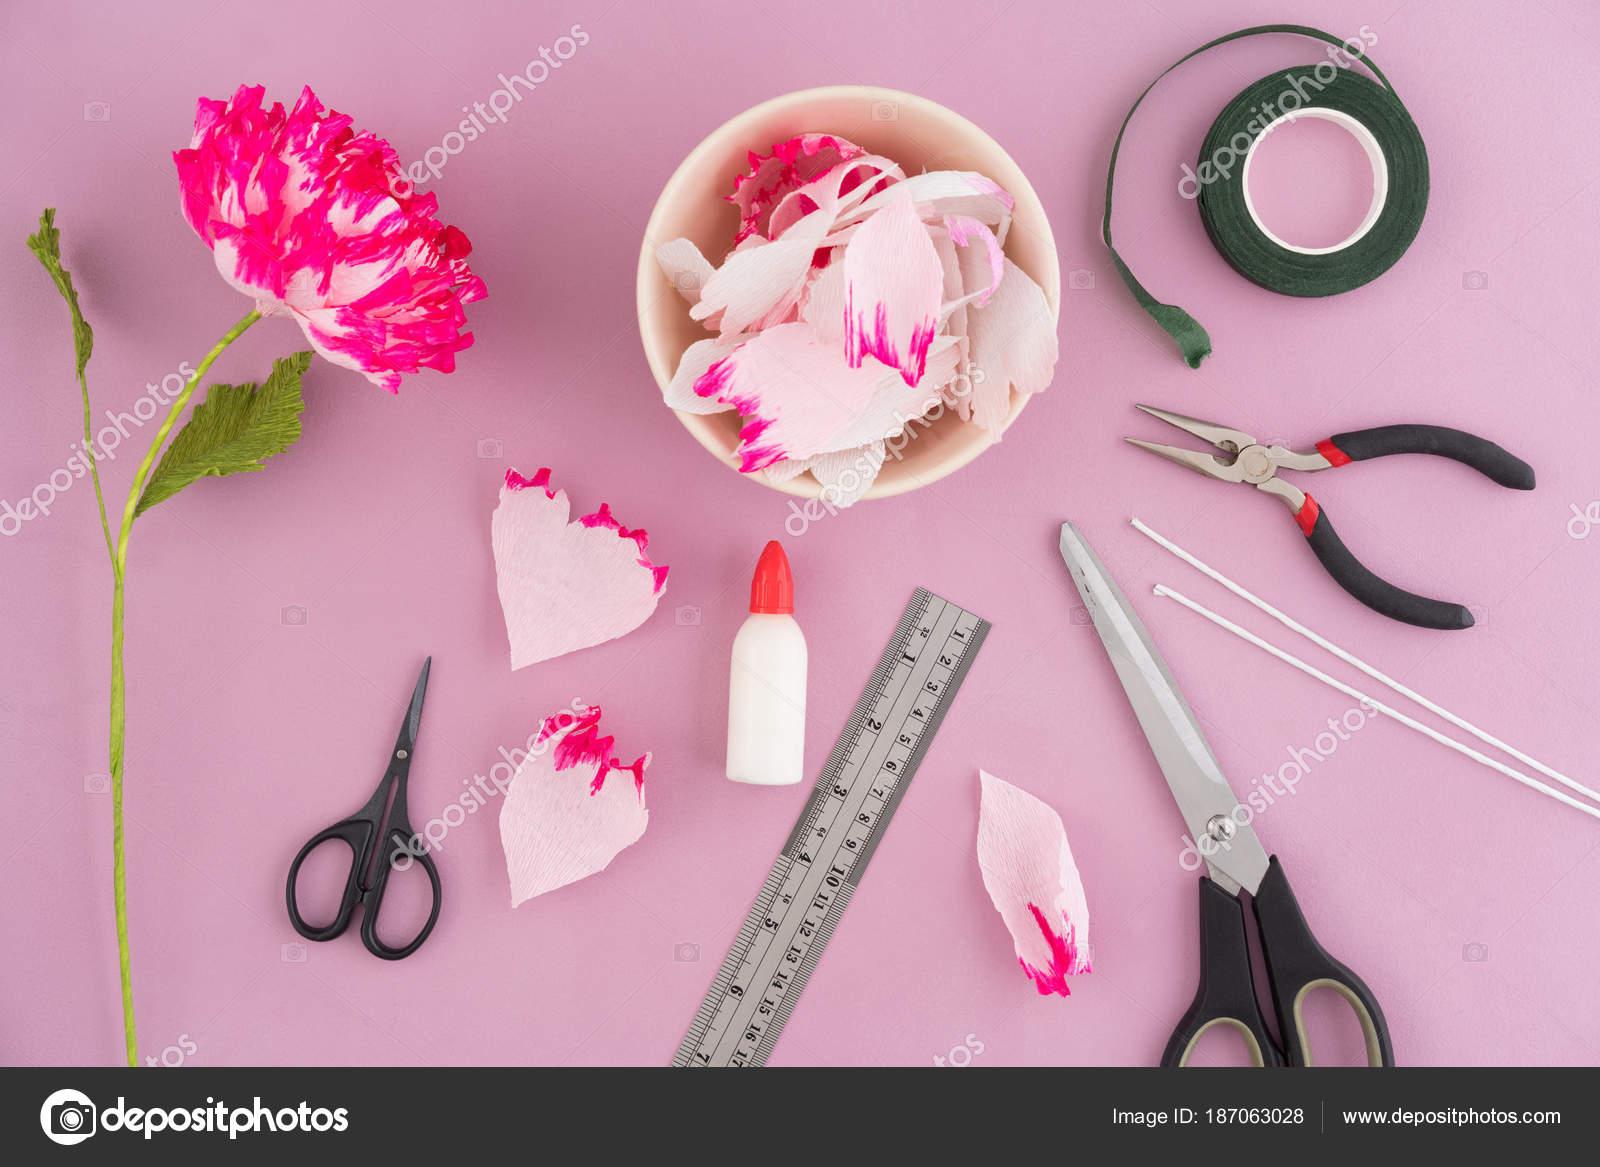 Making Paper Flowers Stock Photo Ecoelfen 187063028